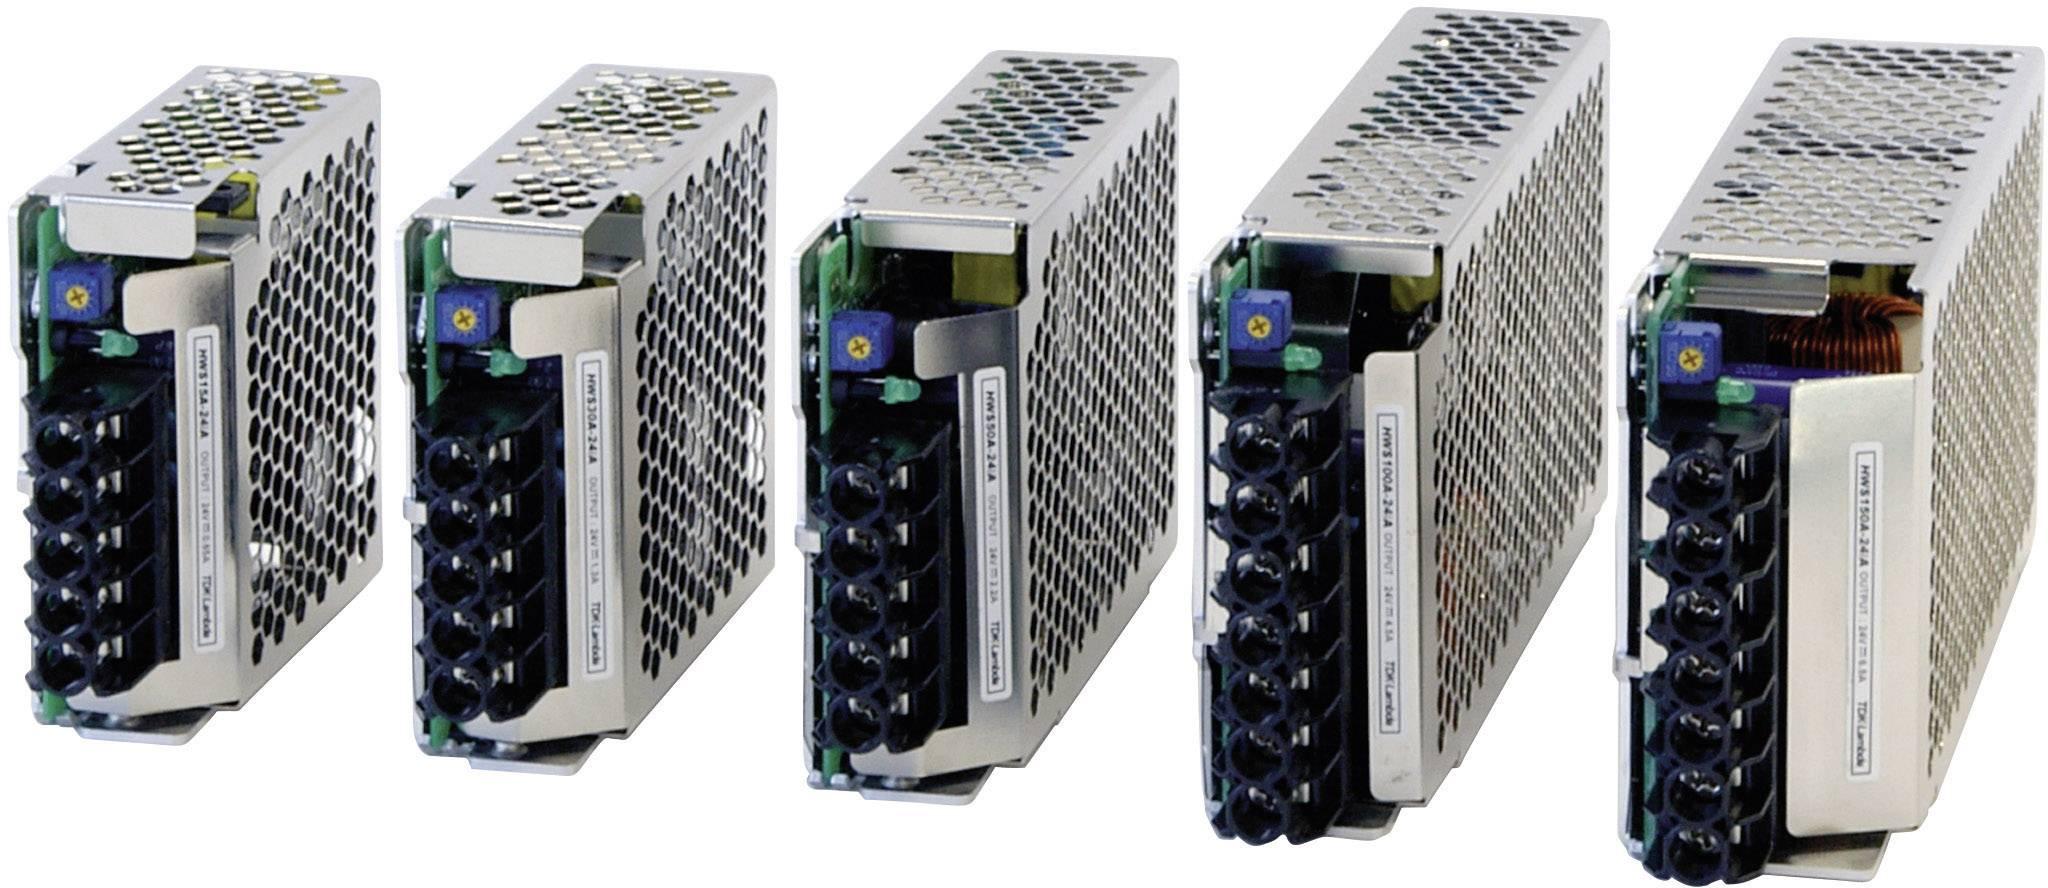 Zabudovateľný napájací zdroj TDK-Lambda HWS-30A-24/A, 24 V, 31,2 W